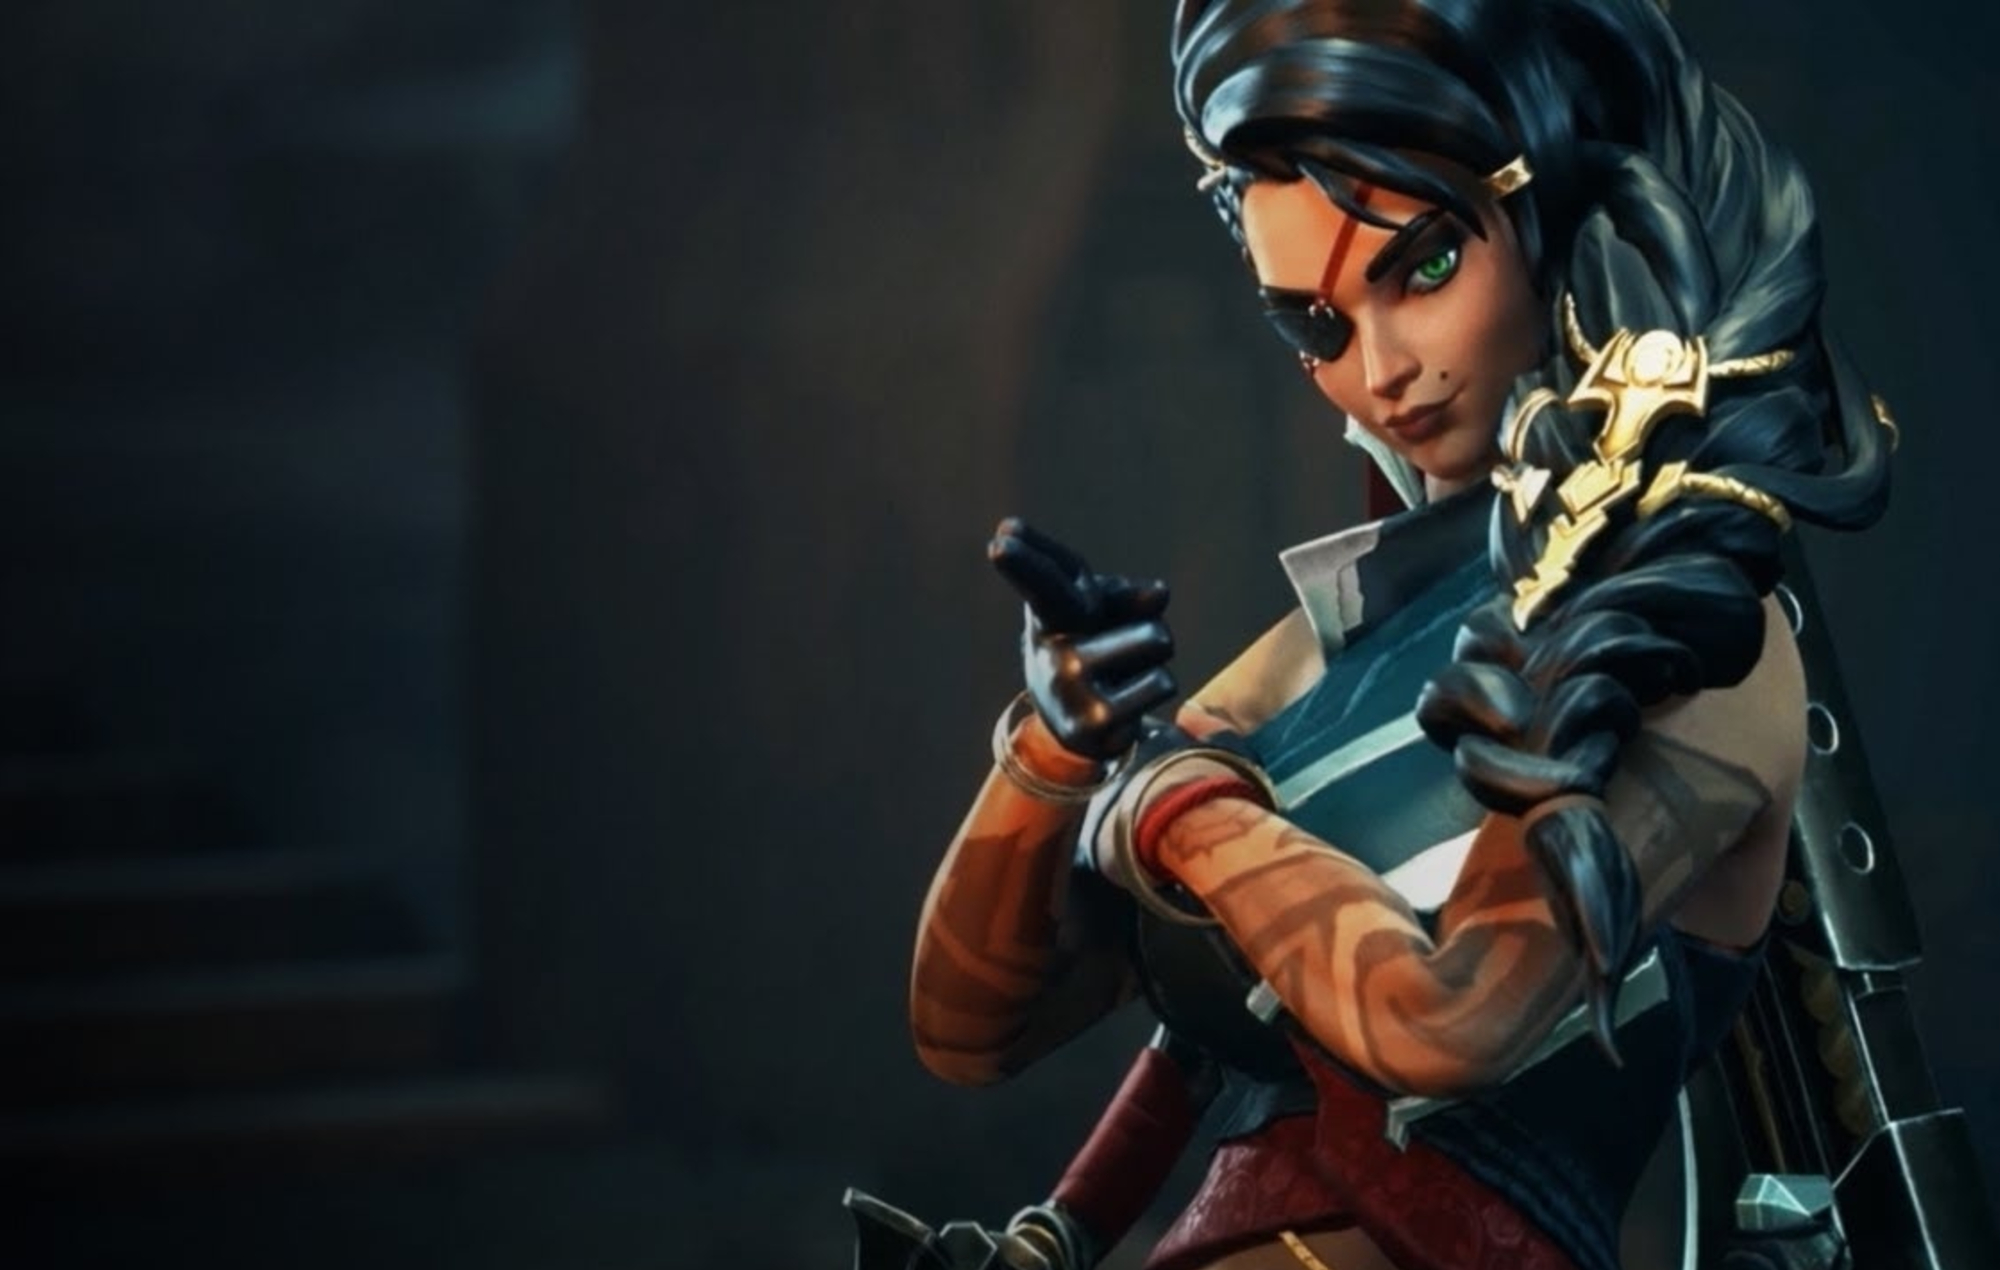 Riot Games Reveals New League Of Legends Champion Samira